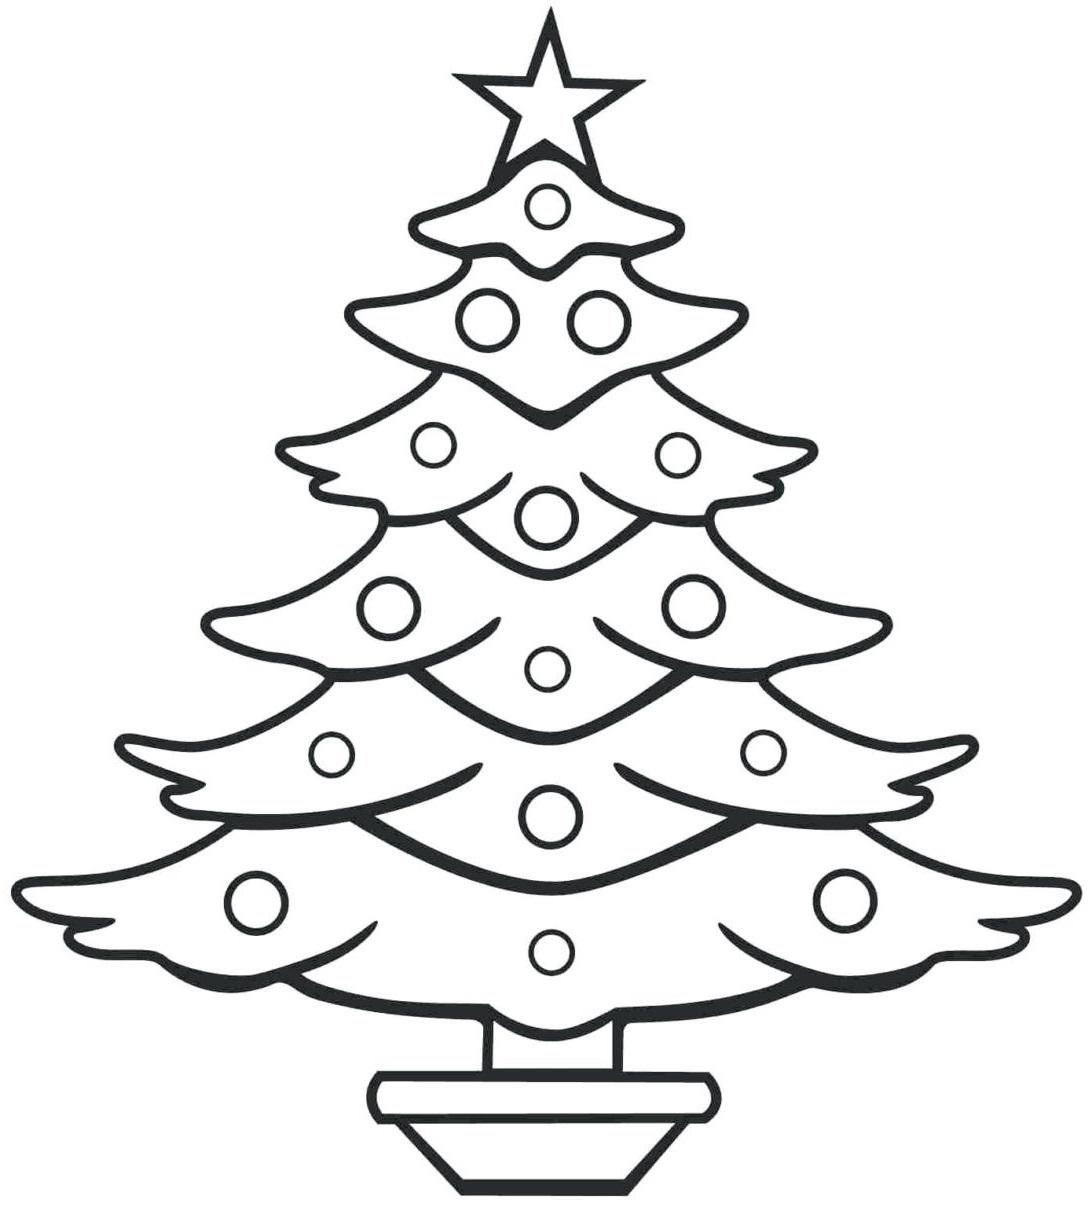 Картинка черно-белая елка